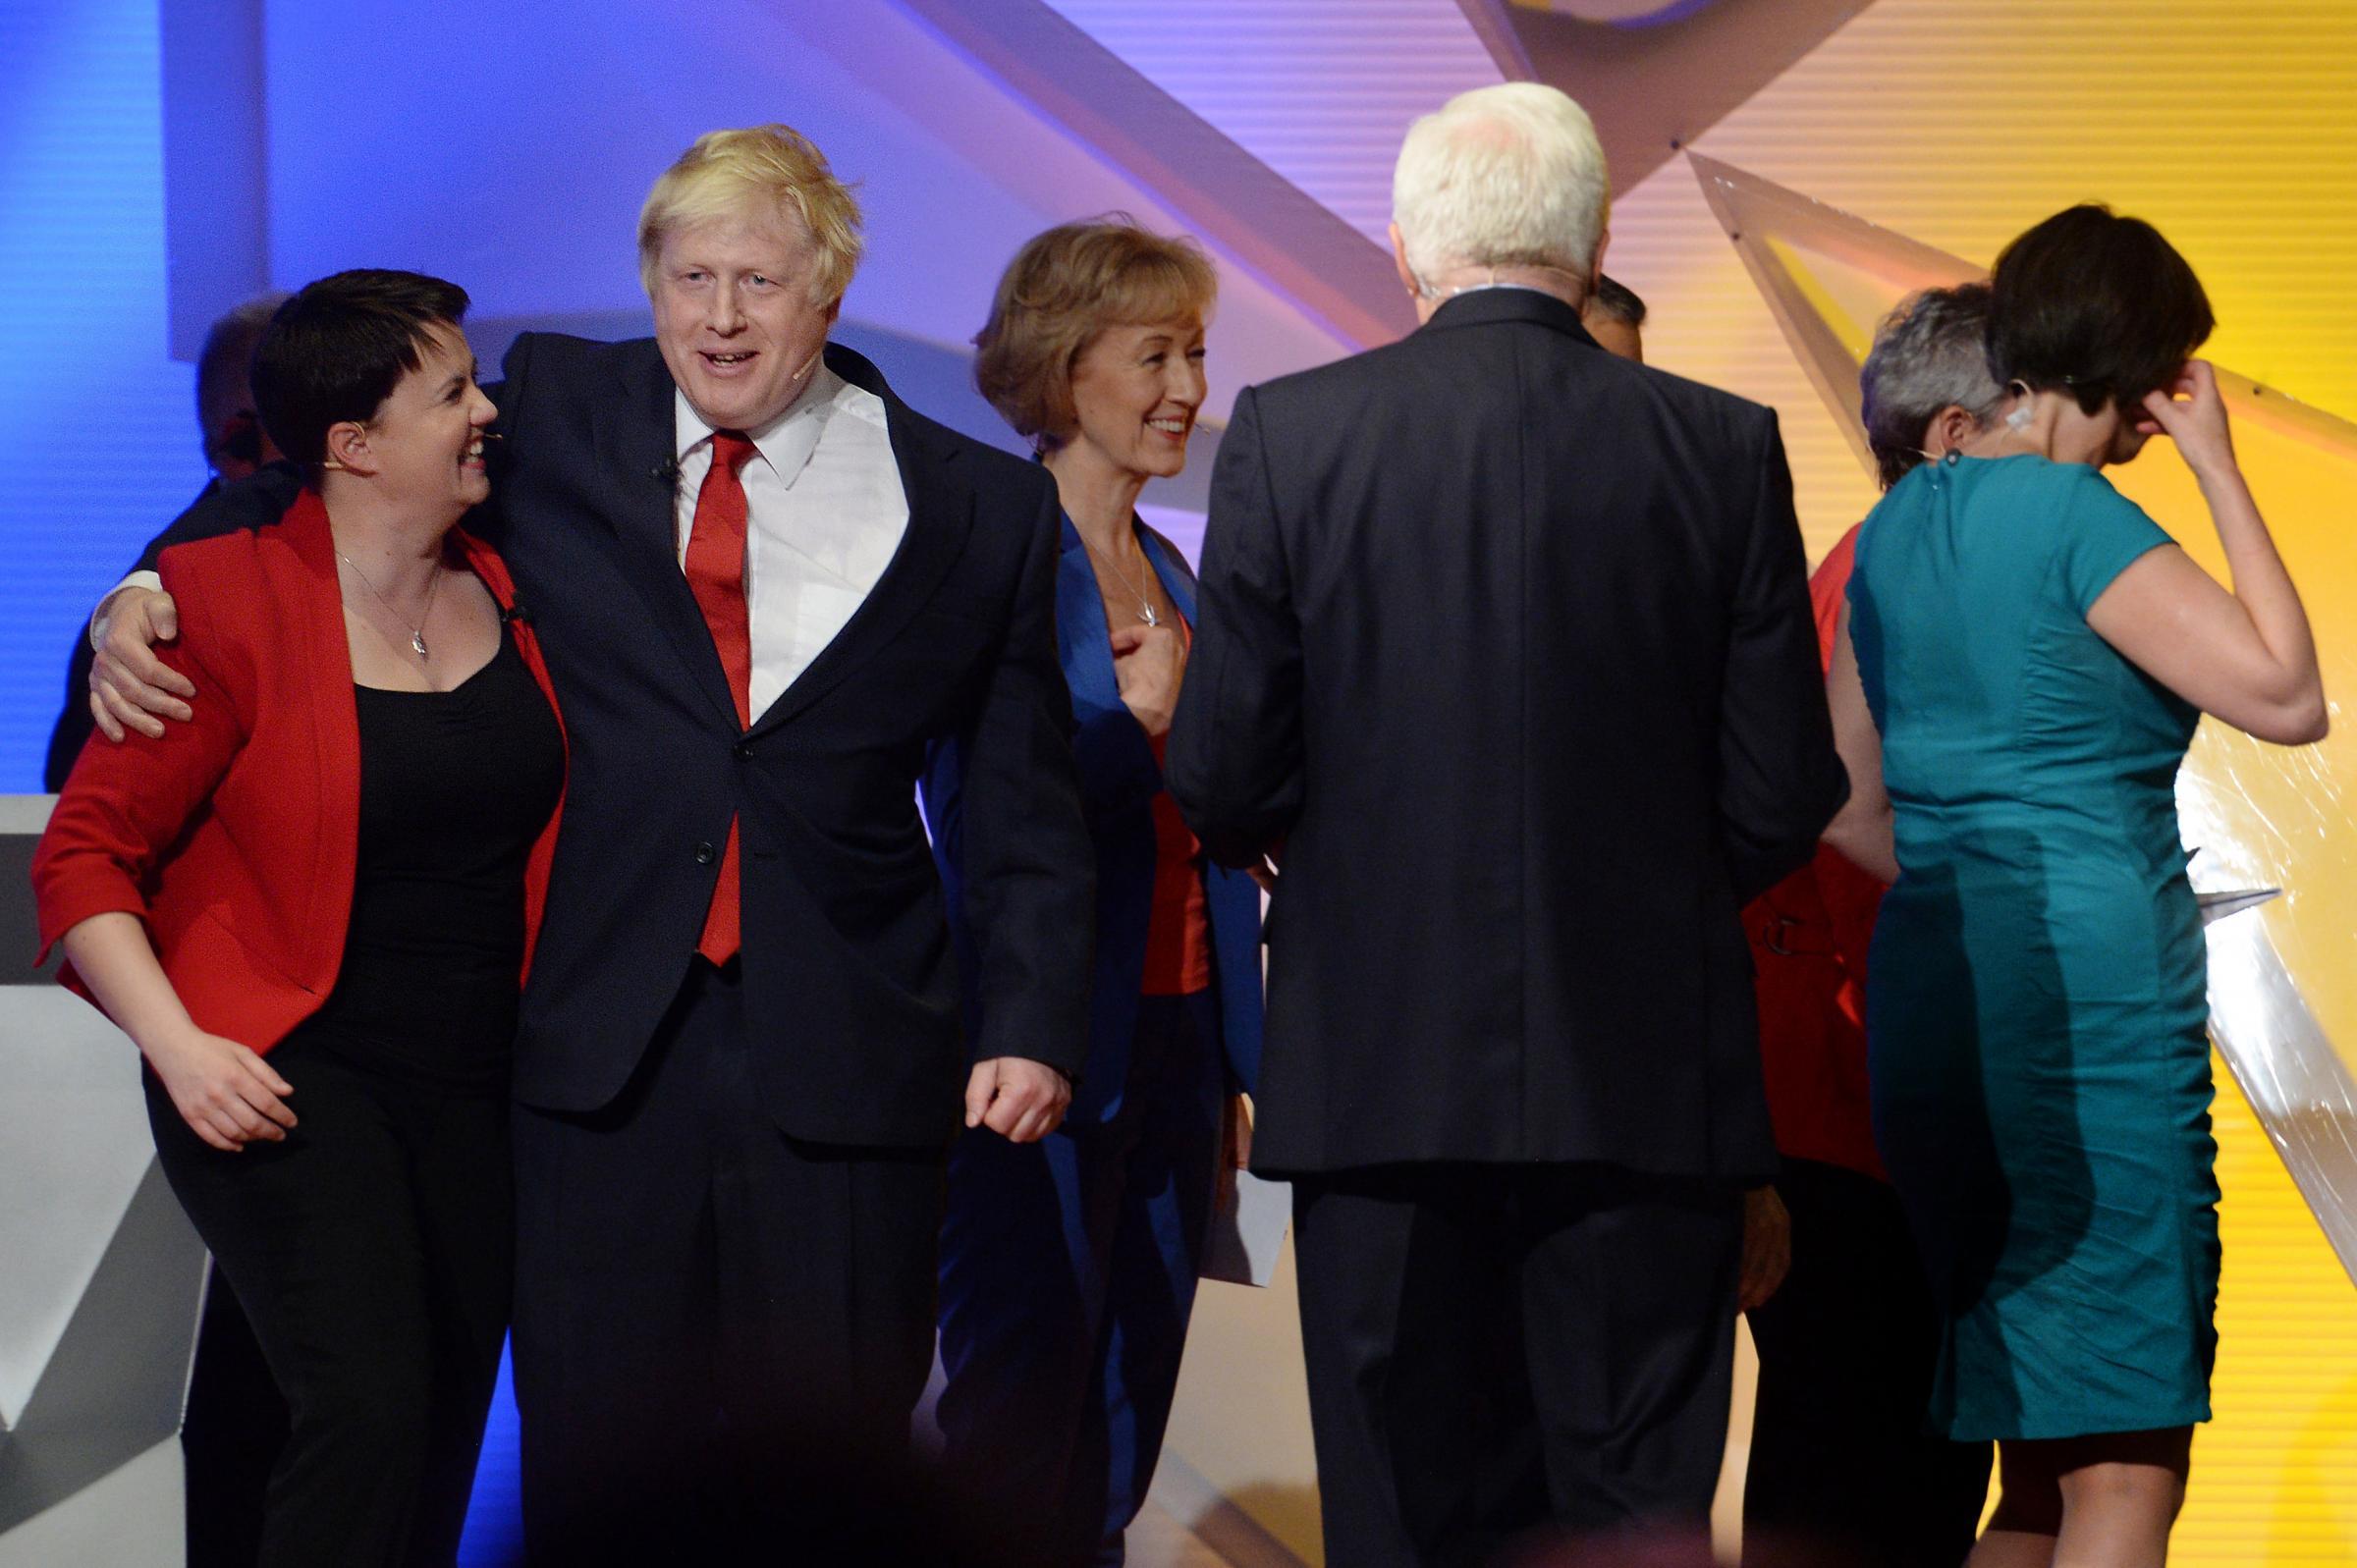 Kevin McKenna: Prime Minister Boris Johnson spells disaster for Ruth Davidson